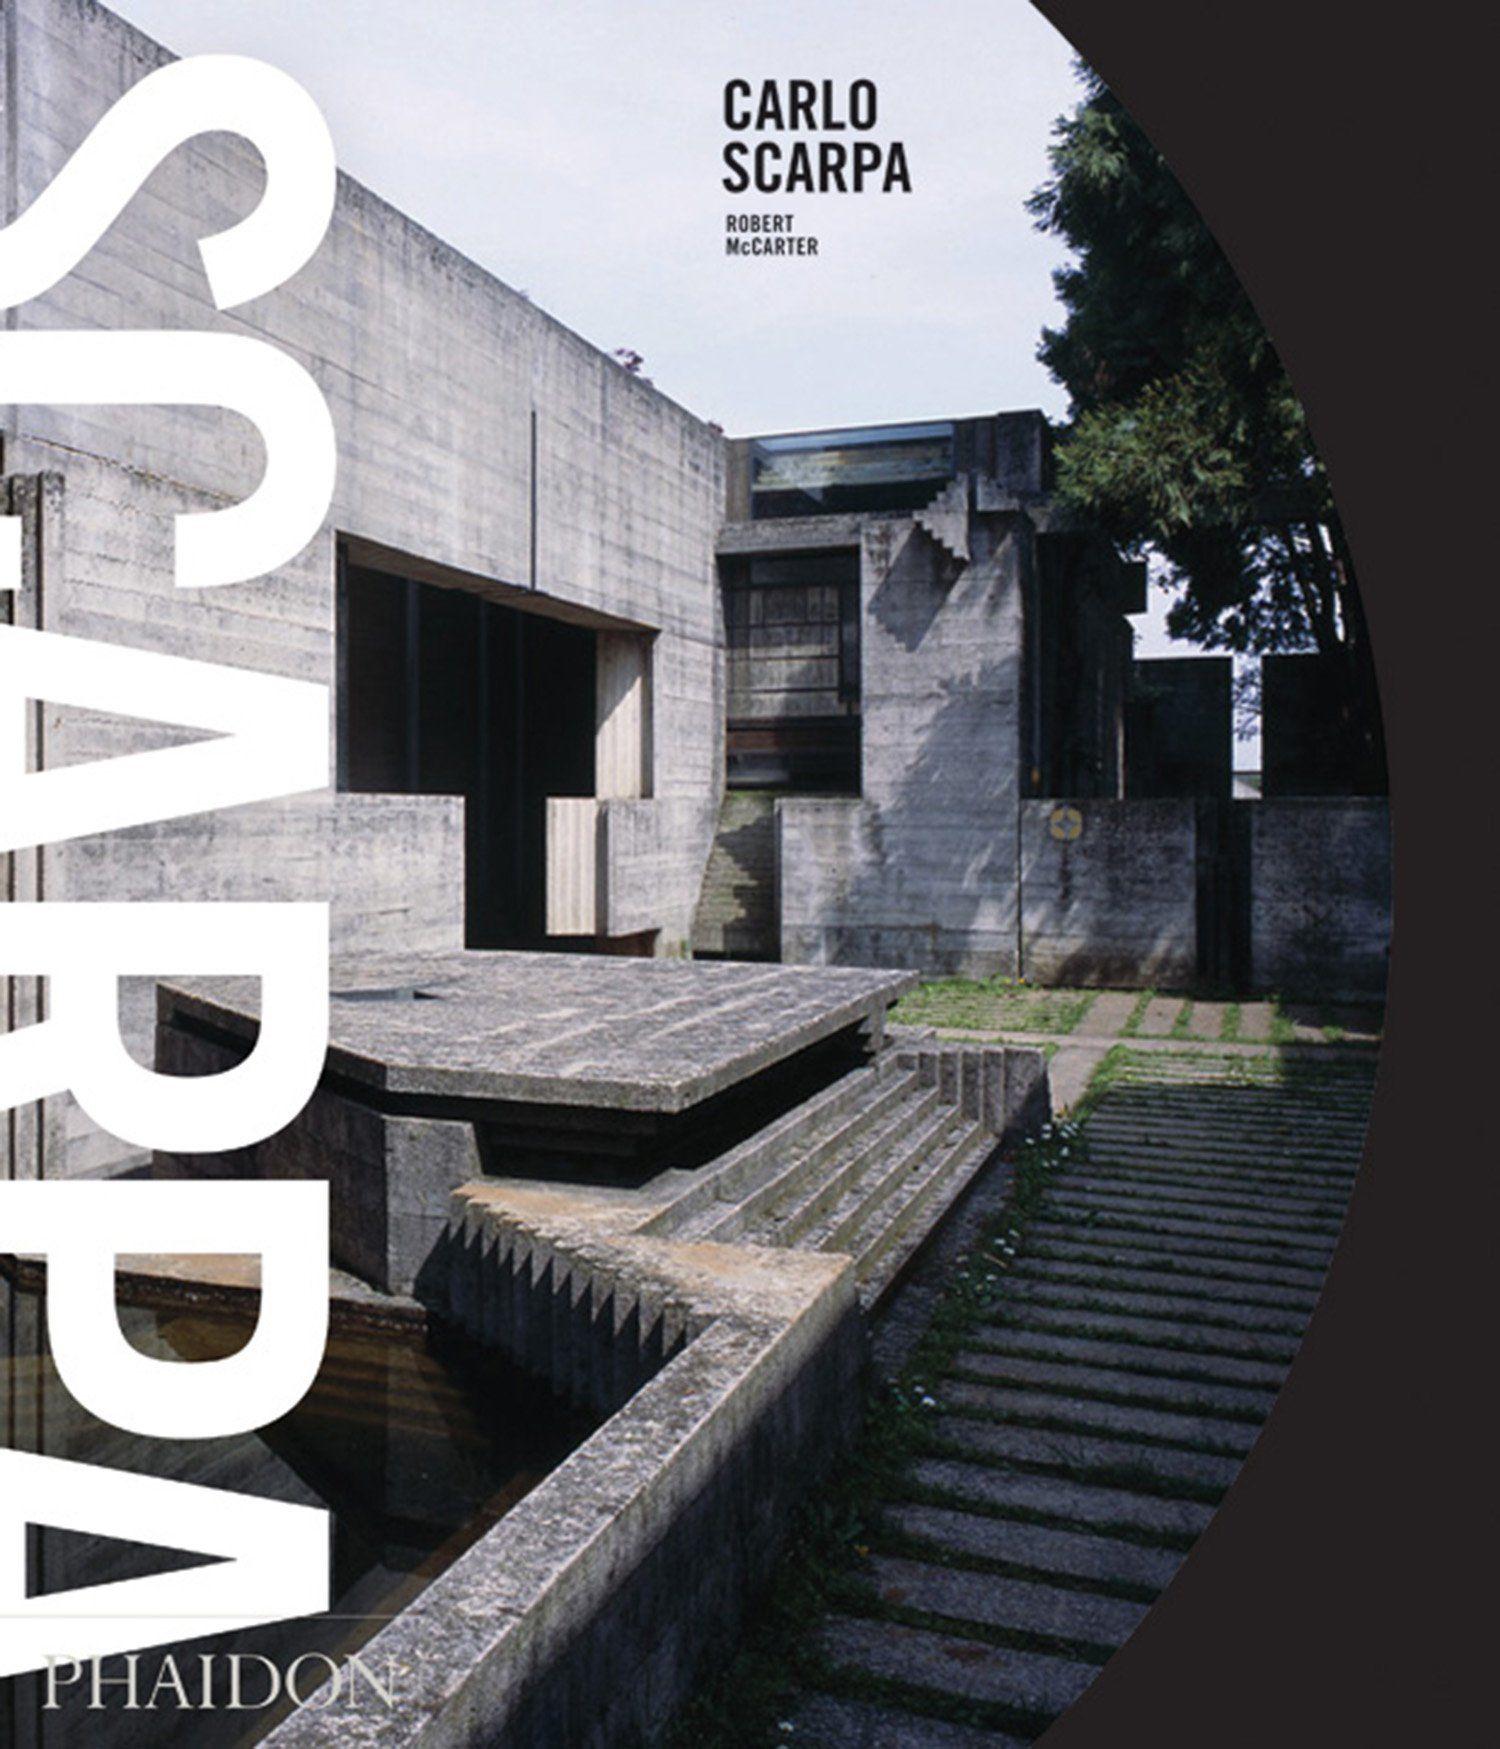 Robert McCarter. Carlo Scarpa